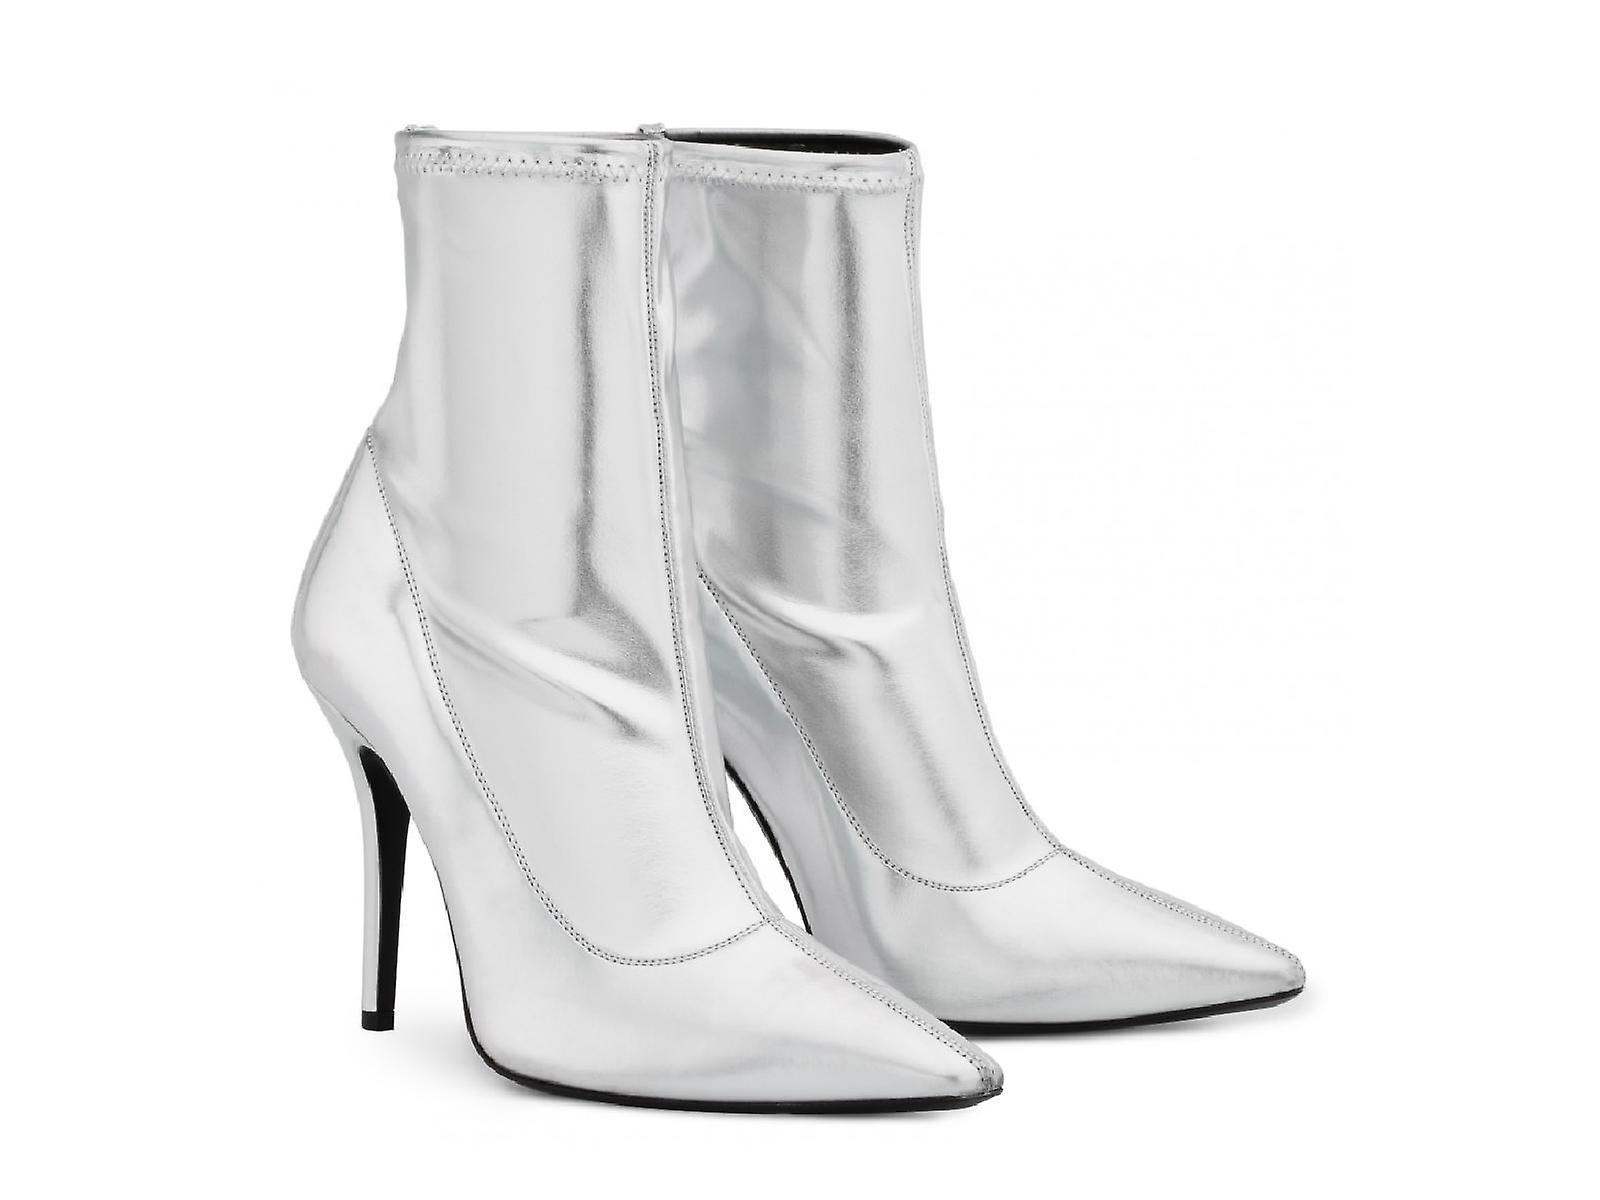 Giuseppe Zanotti Women's mid-calf stiletto booties in silver Soft leather LCROZ